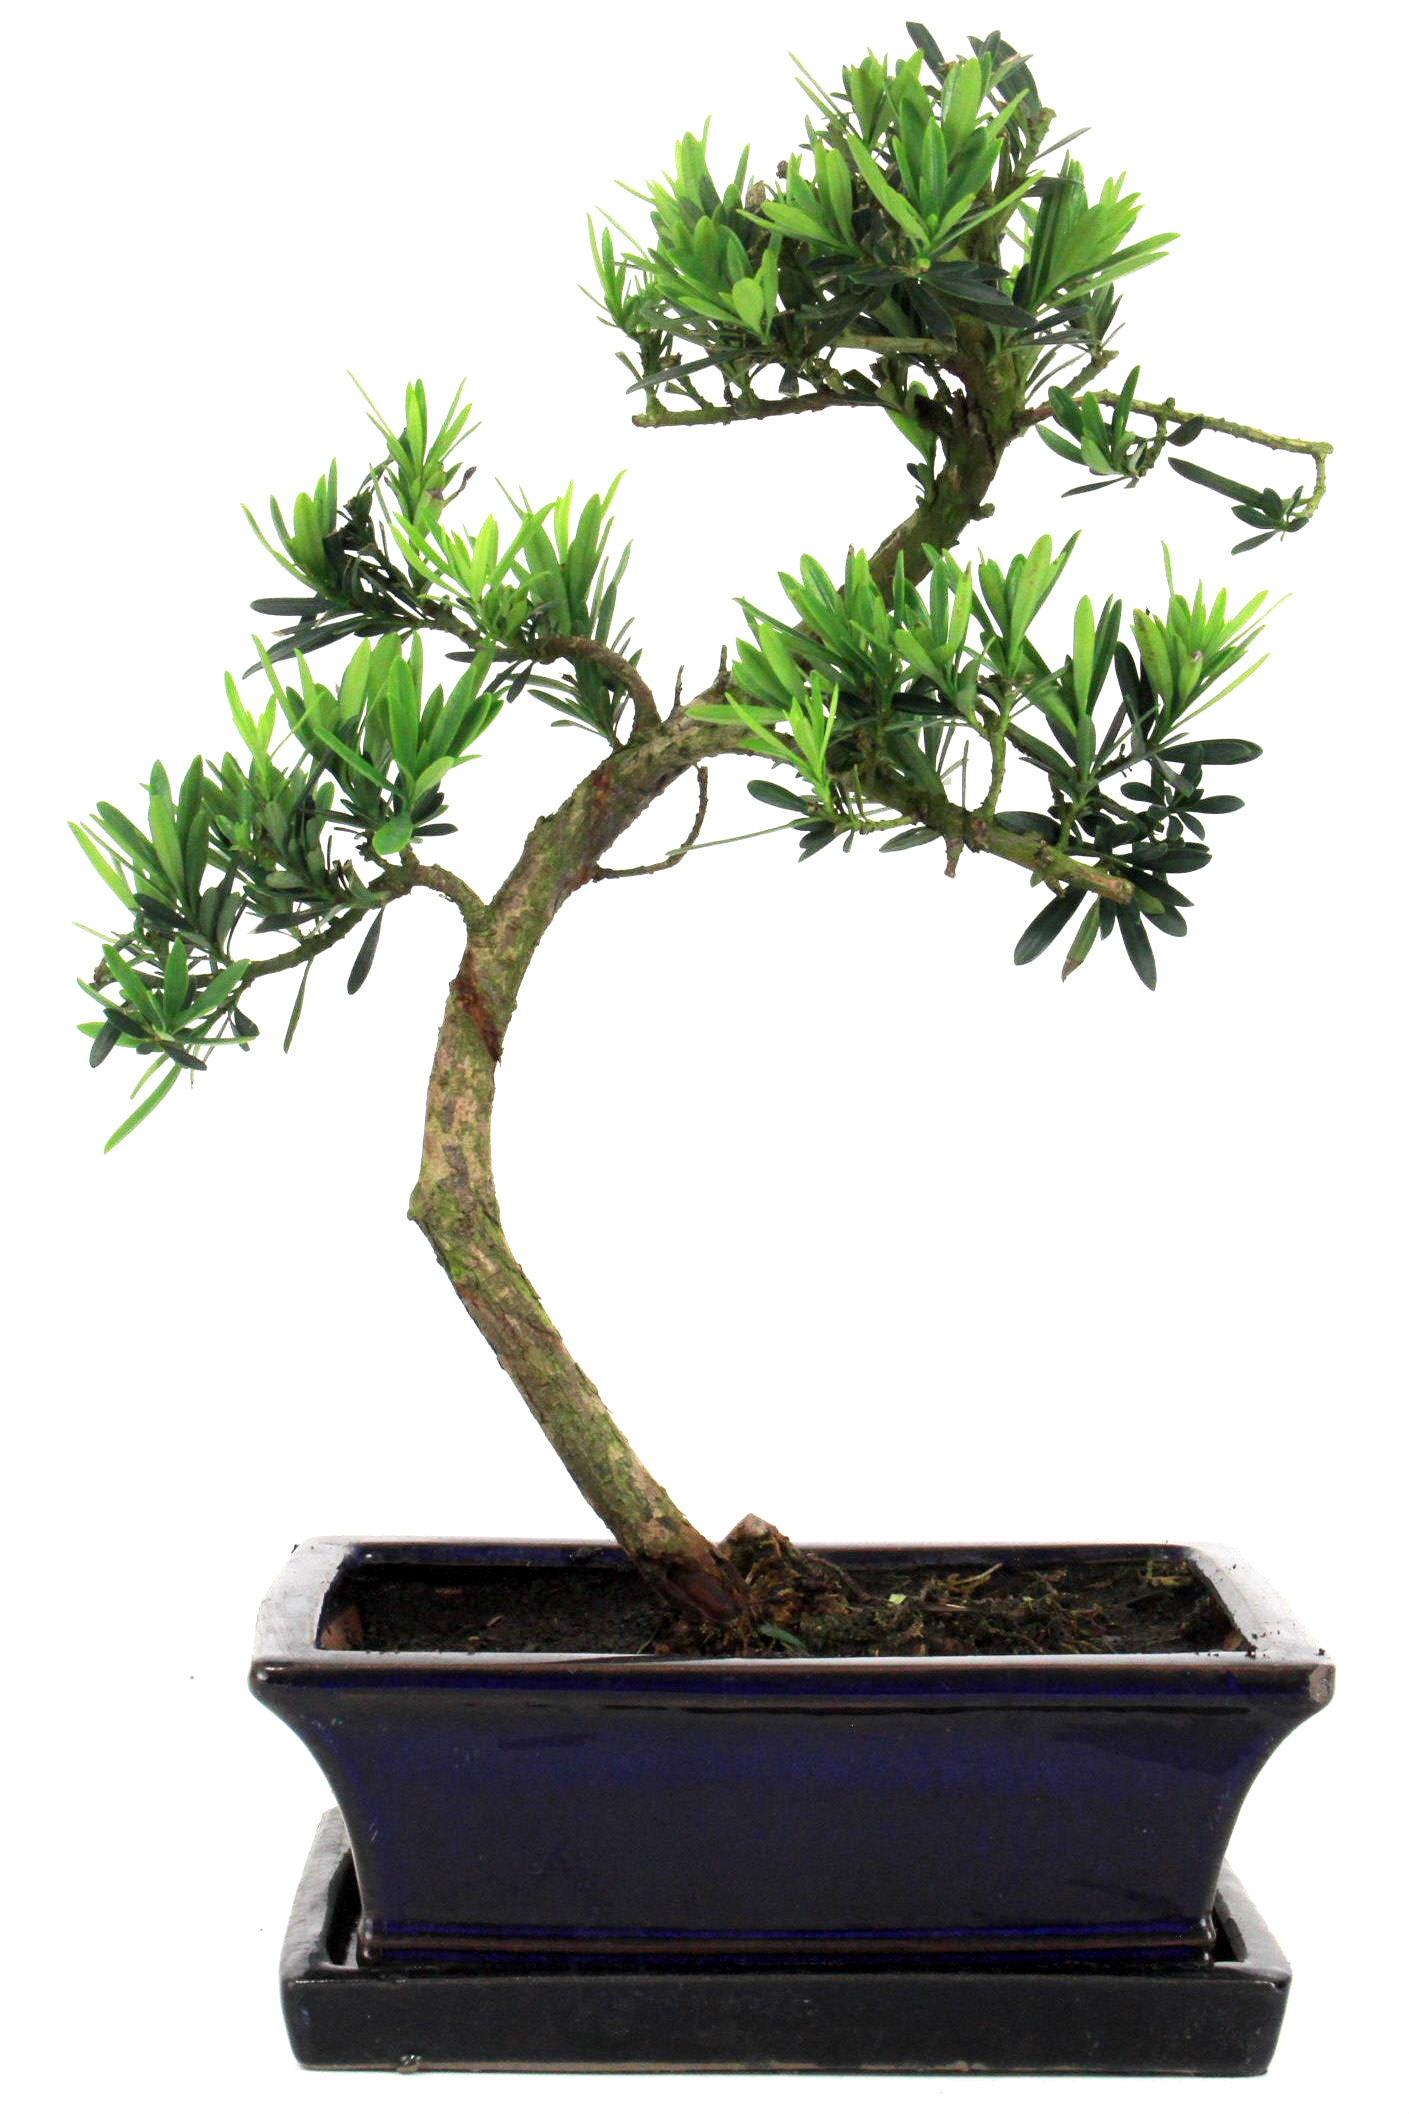 steineibe bonsai 35 40 cm 1920 bei oyaki bonsai kaufen. Black Bedroom Furniture Sets. Home Design Ideas